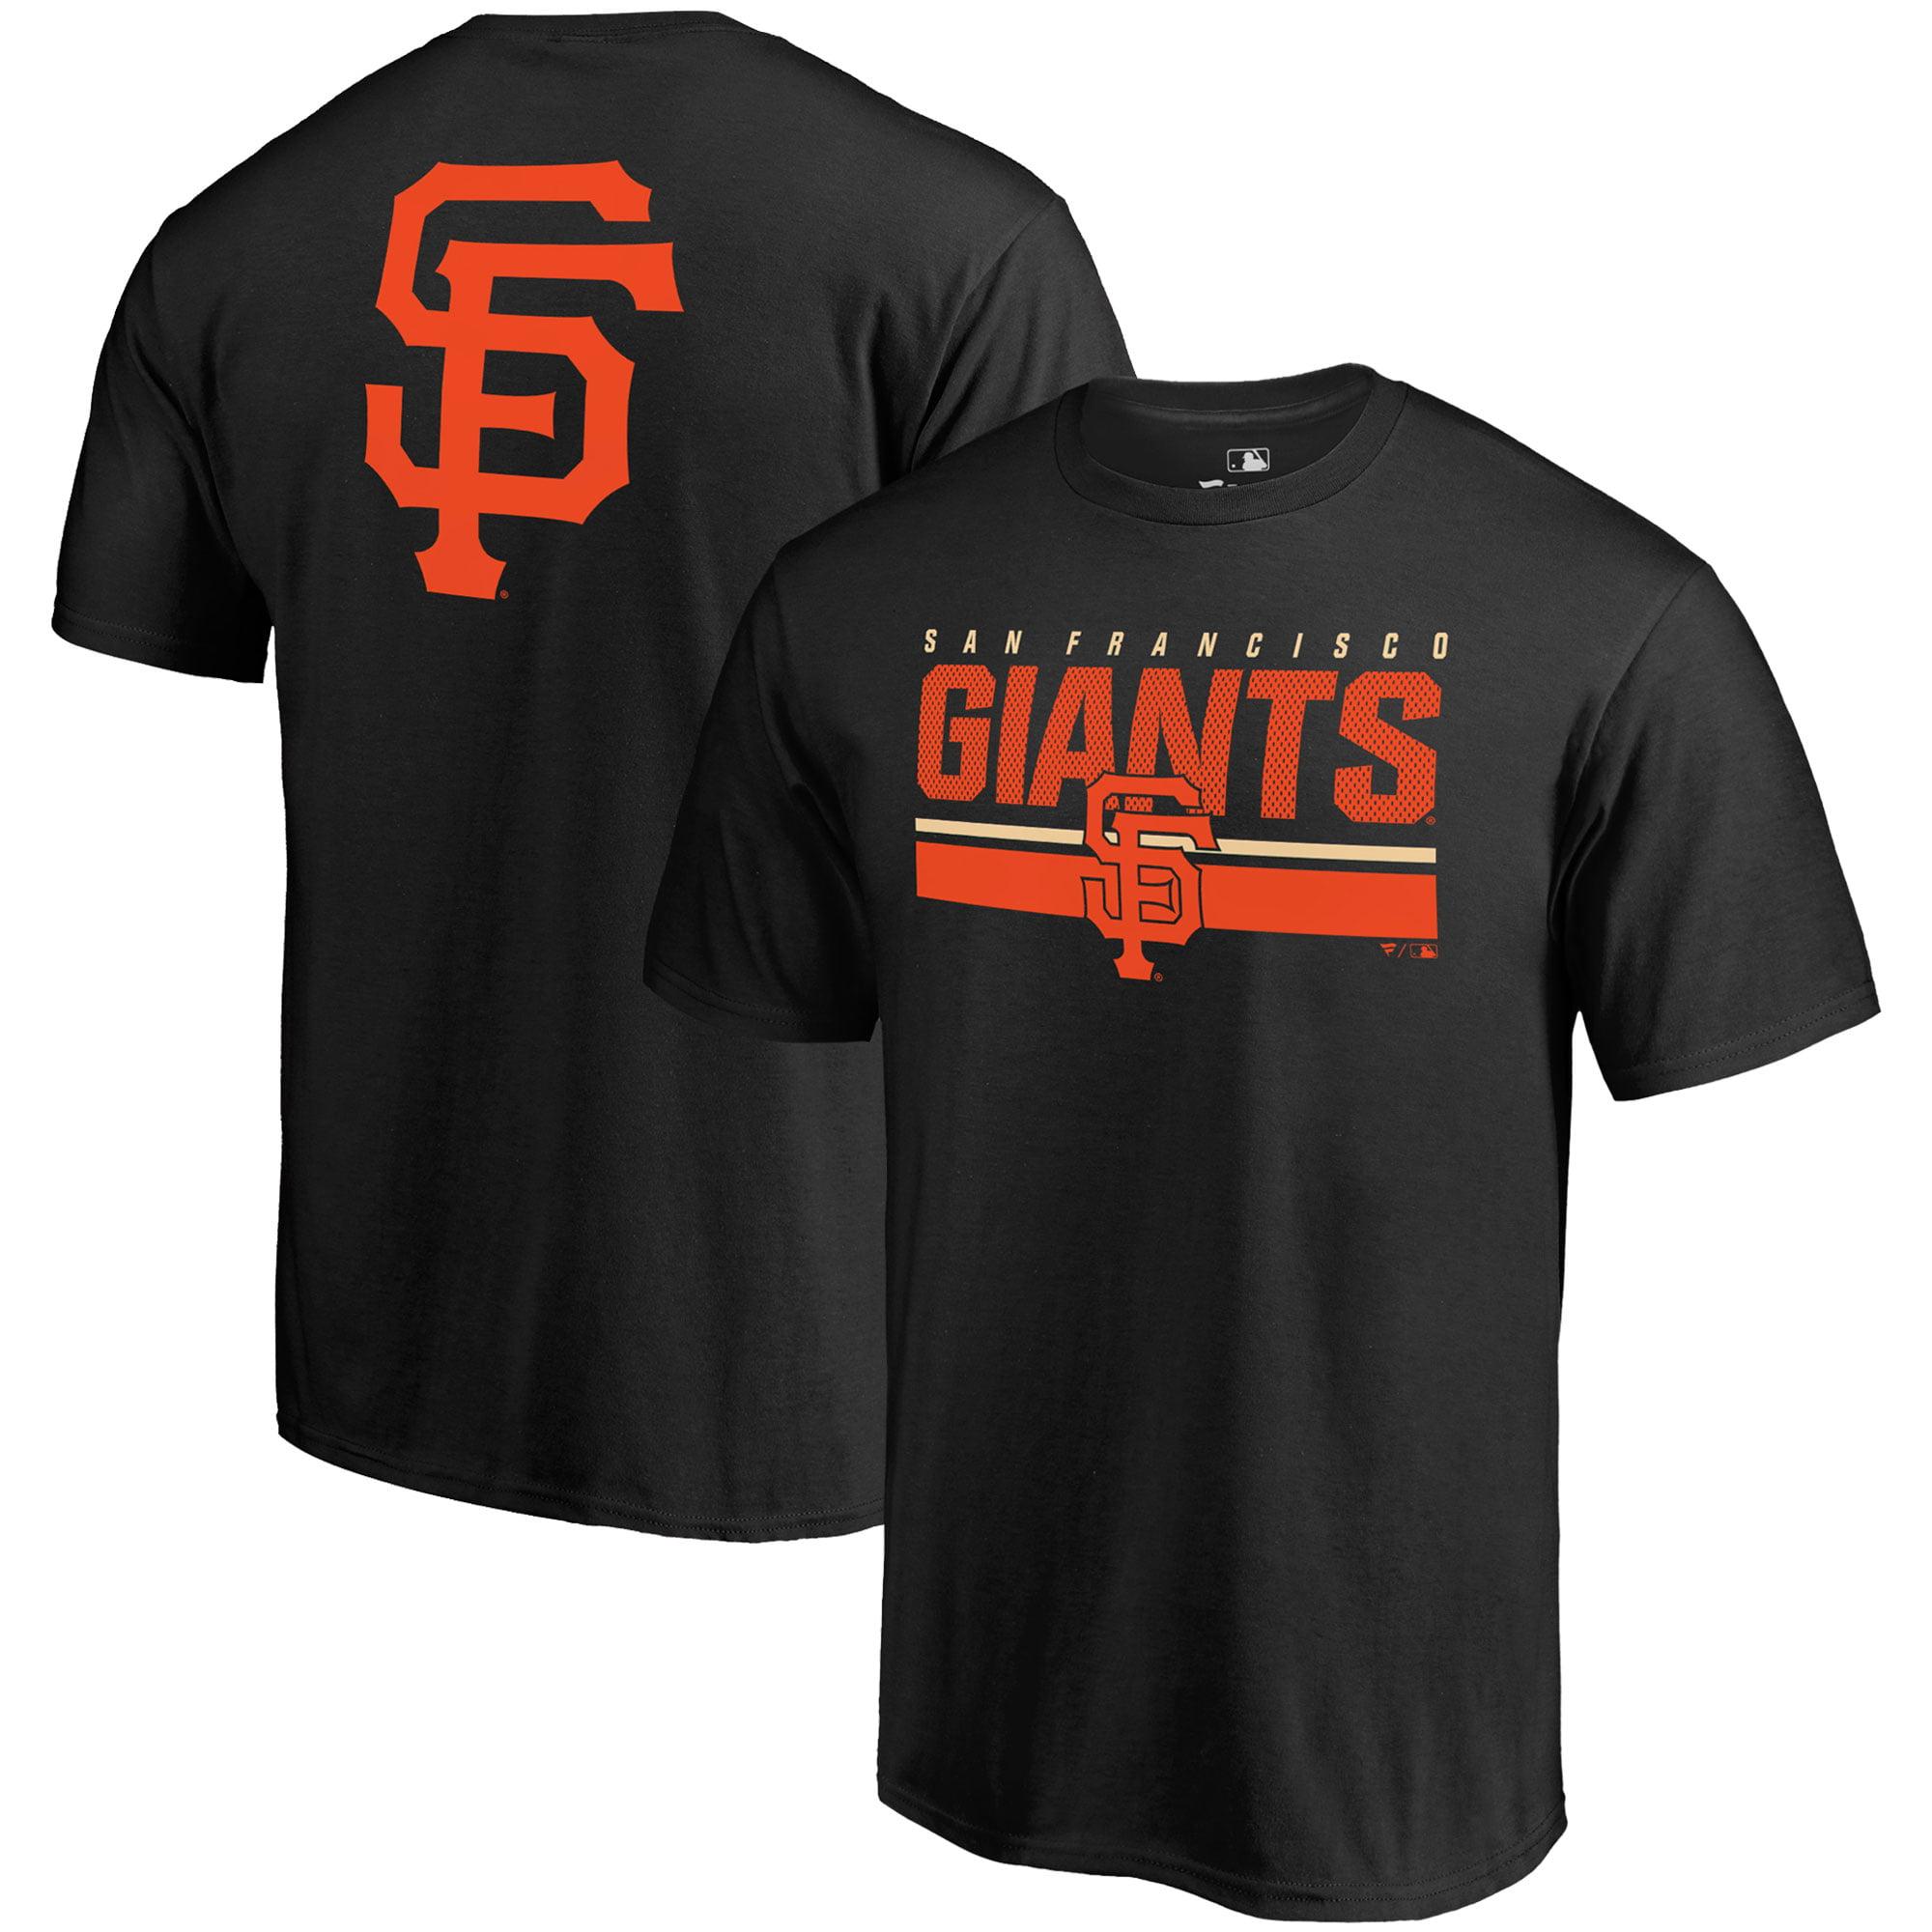 San Francisco Giants Fanatics Branded Big & Tall End Game T-Shirt - Black